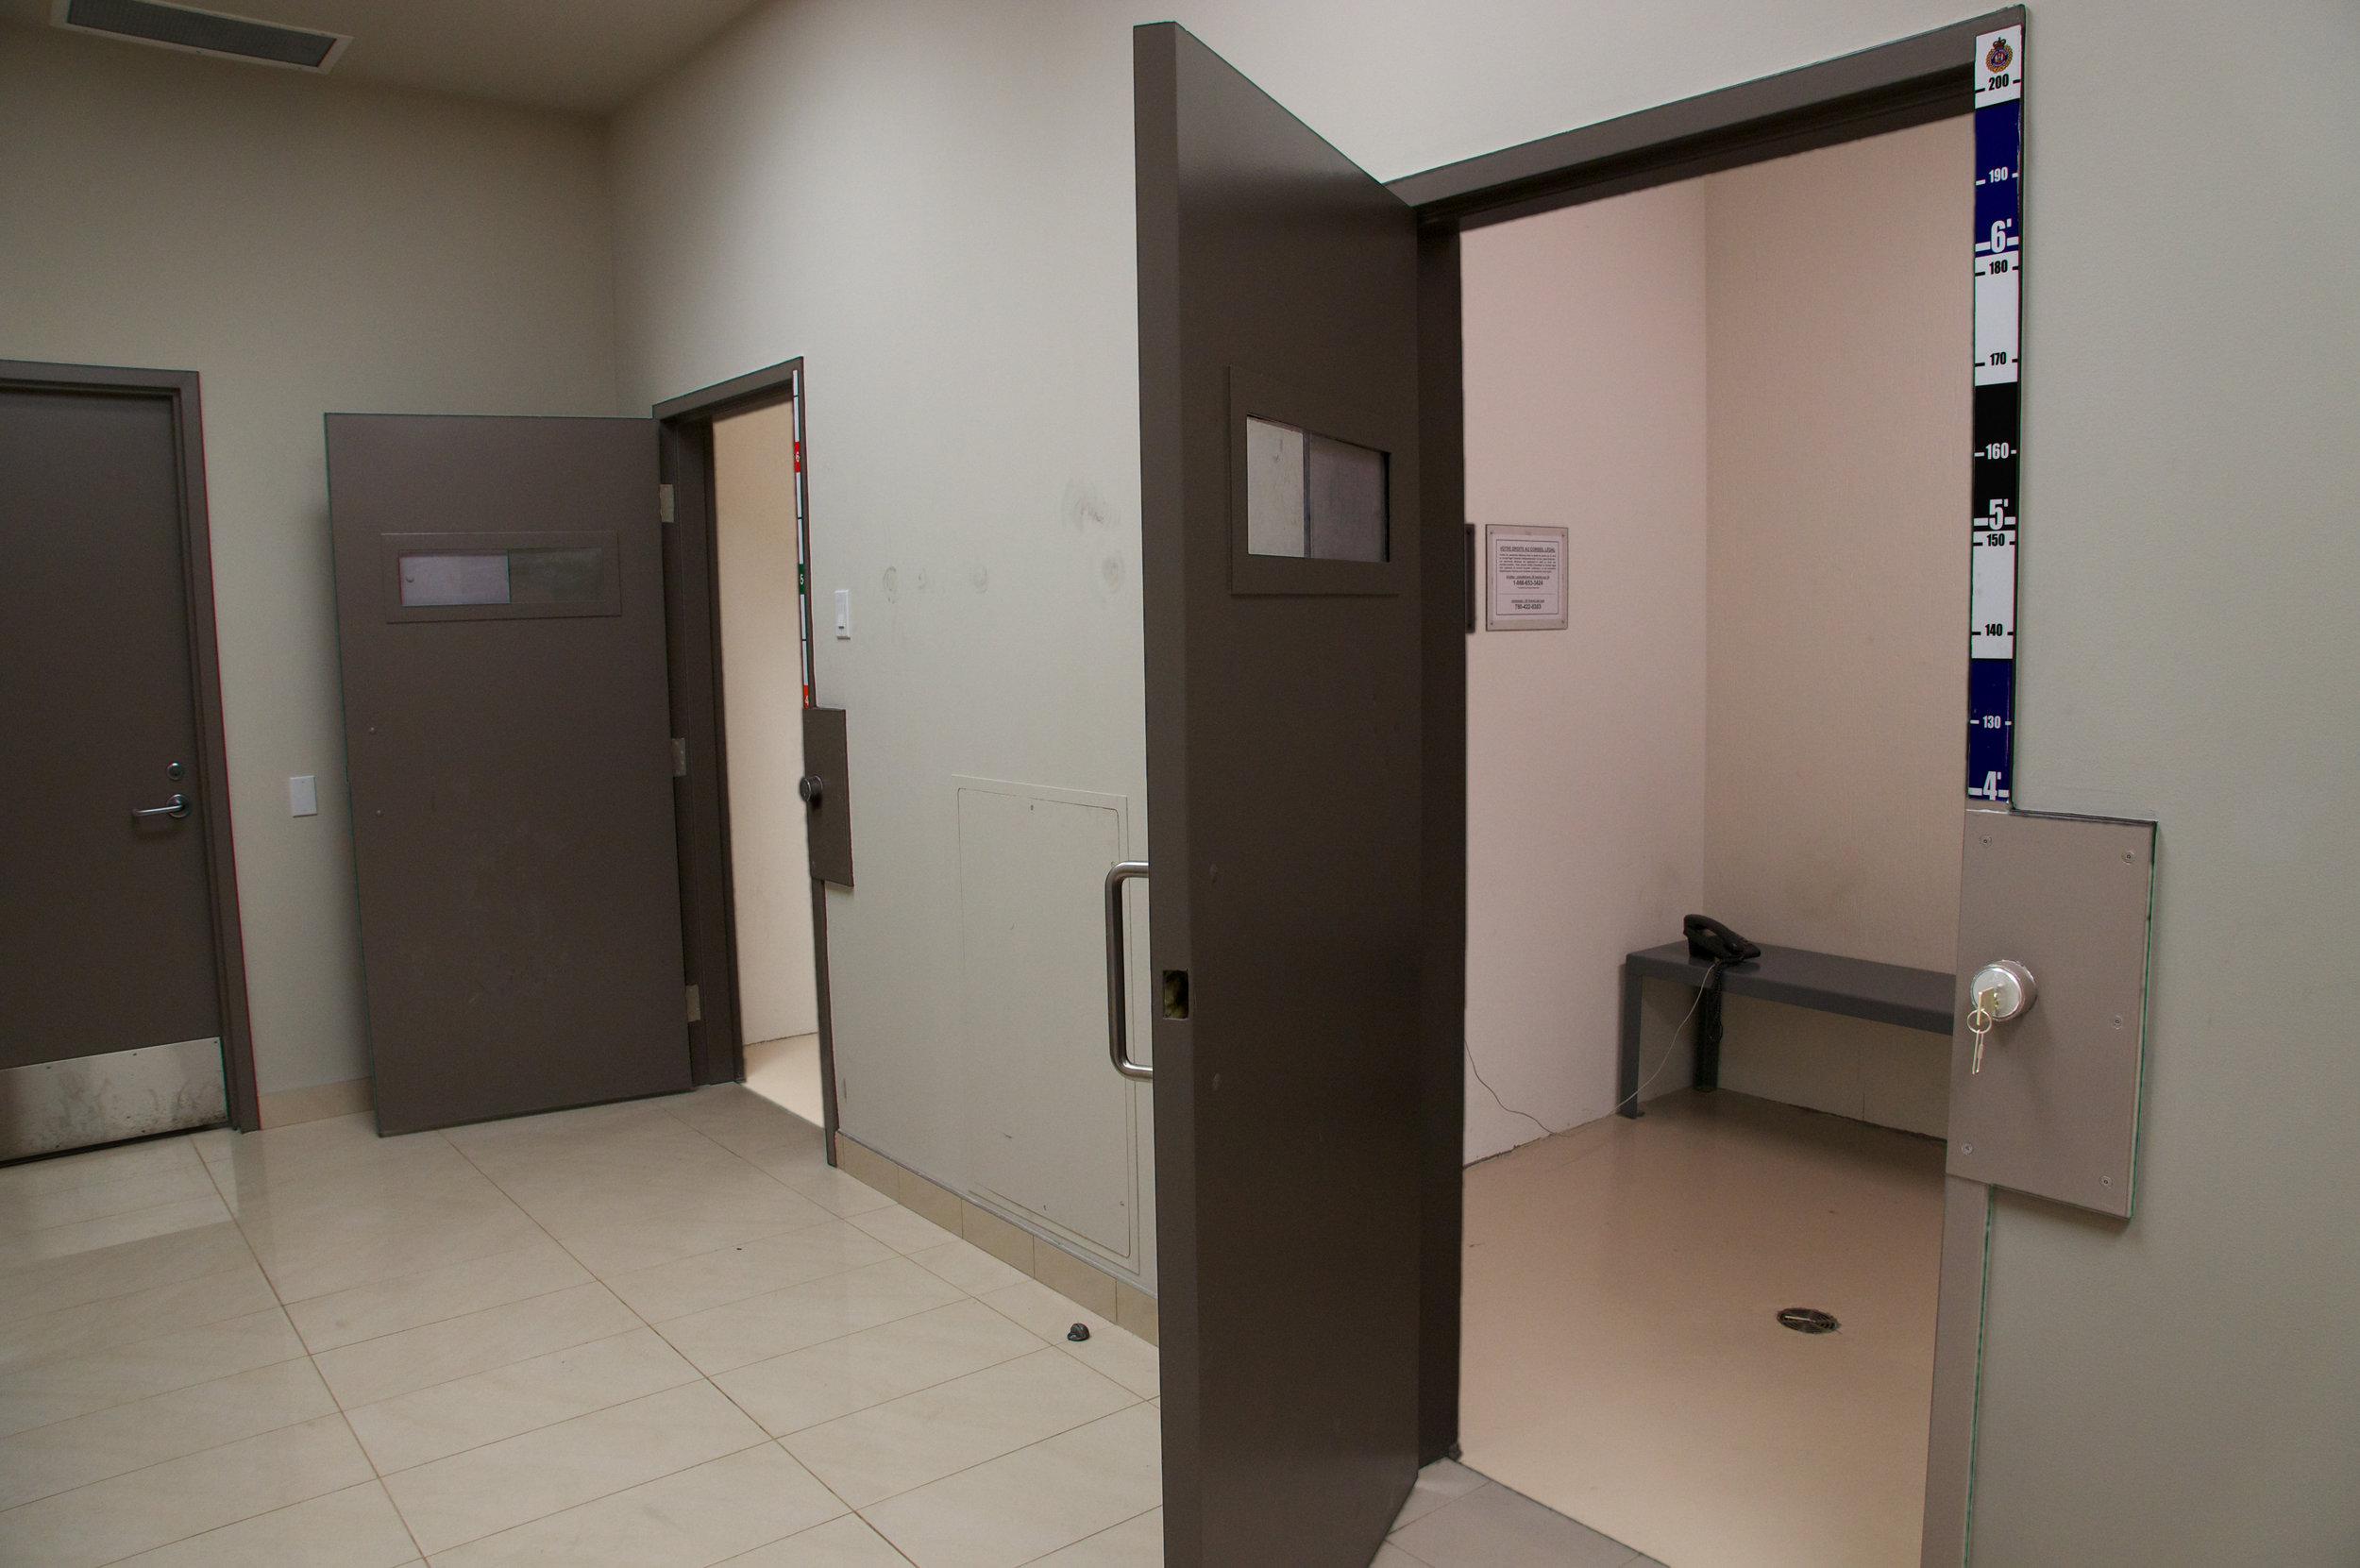 Edmonton Police Service - 4 interior 2.jpg